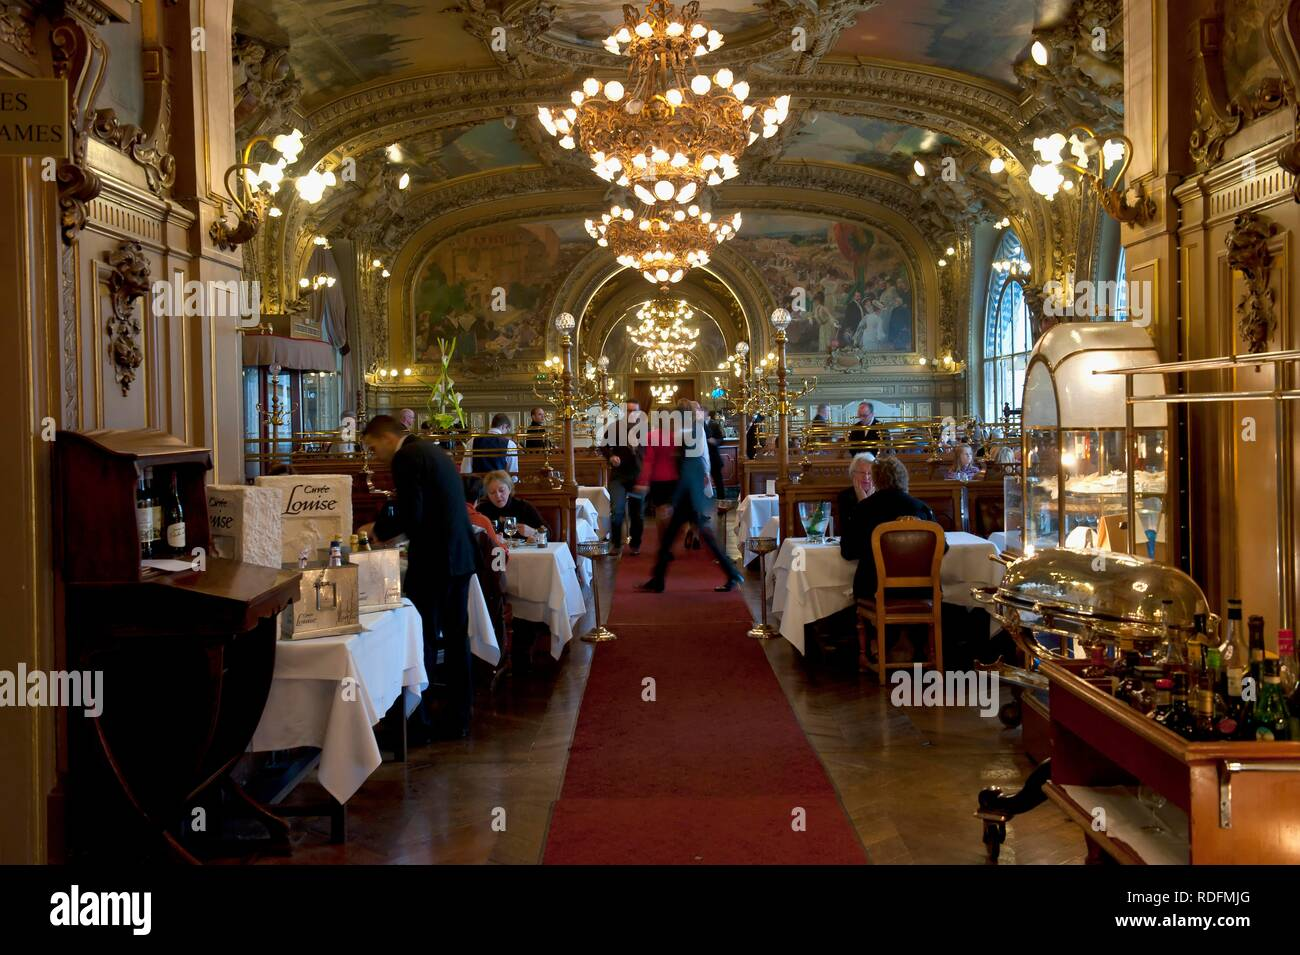 Le Train Bleu restaurant, interior, Lyon railway station, Paris, France, Europe - Stock Image